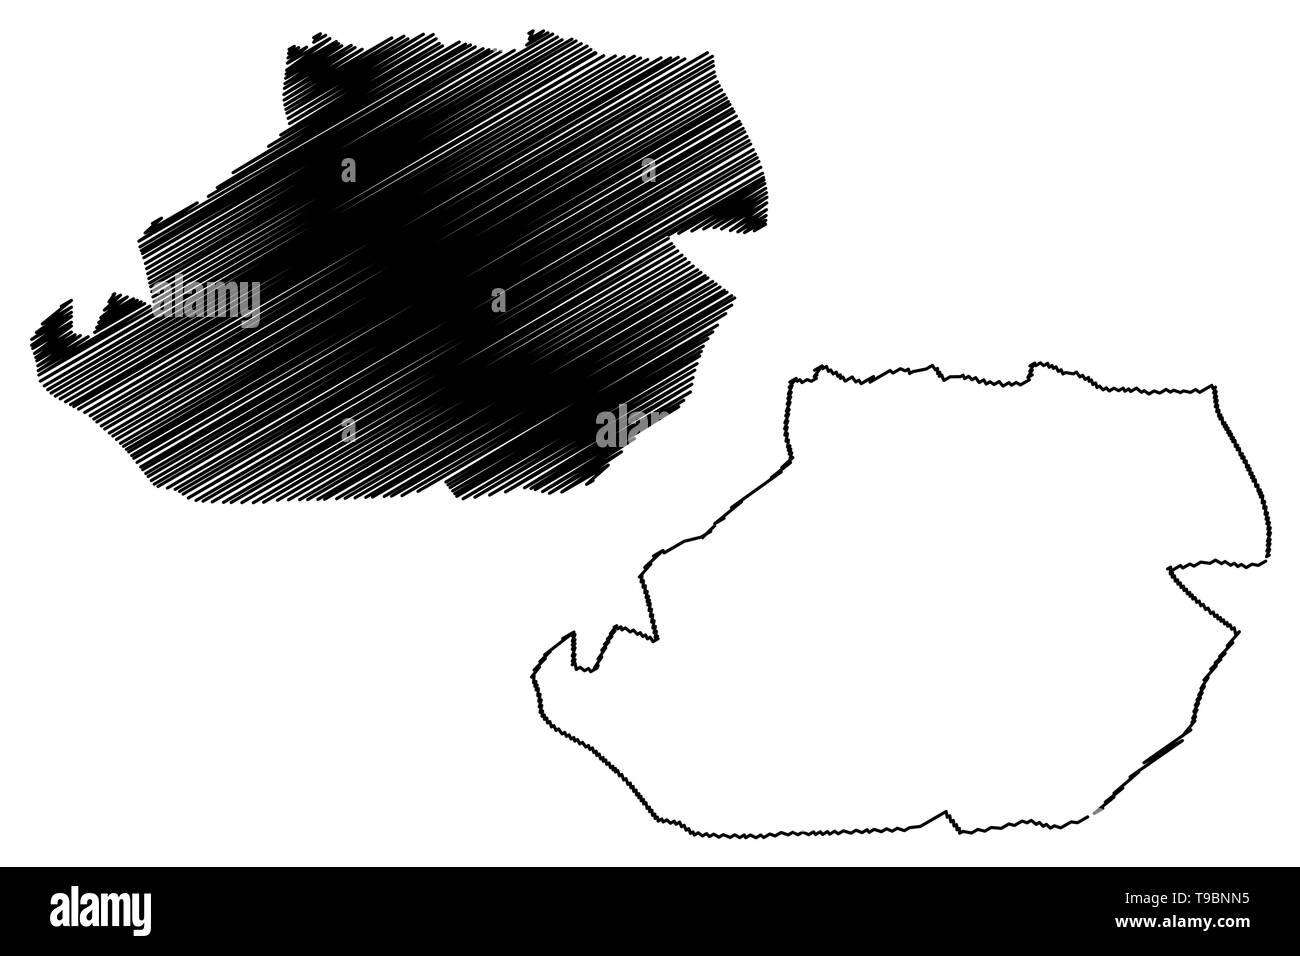 Tizi Ouzou Province (Provinces of Algeria, Peoples Democratic Republic of Algeria) map vector illustration, scribble sketch Tizi Ouzou map - Stock Image